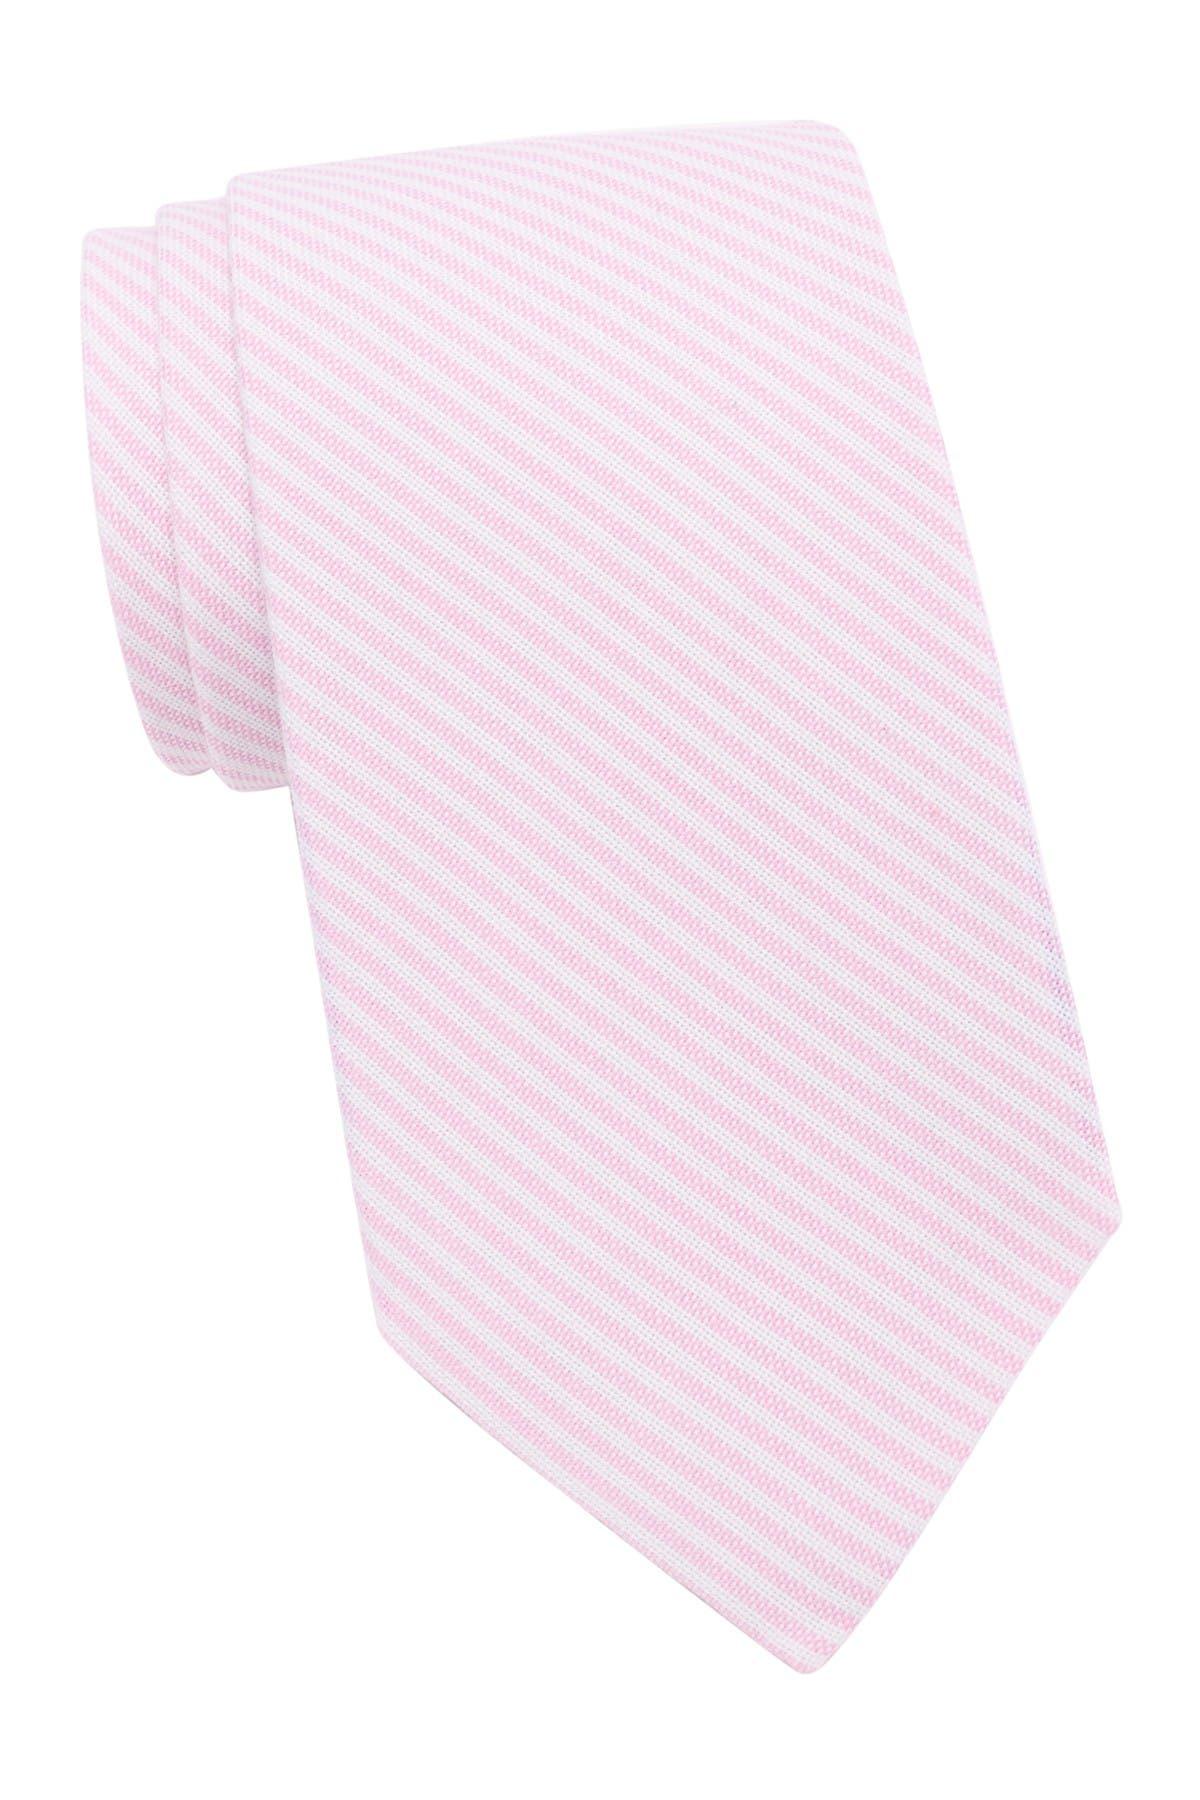 Image of Tommy Hilfiger Haworth Stripe Print Tie